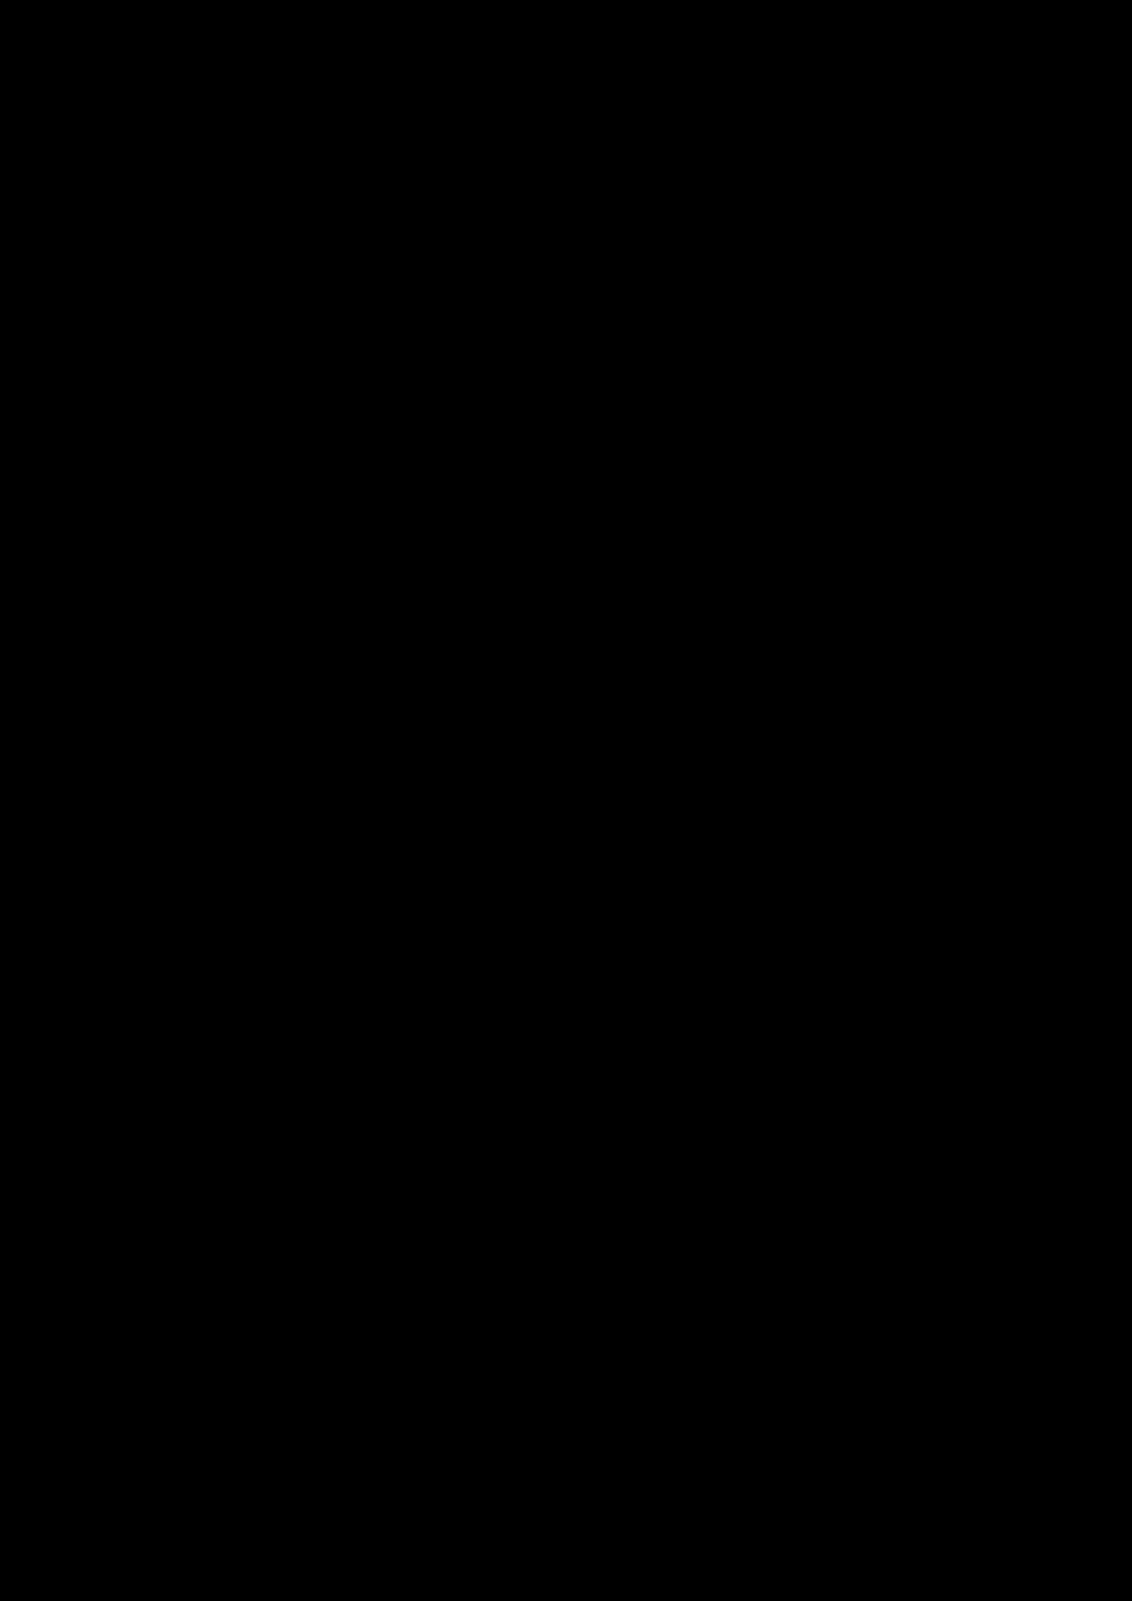 Okean Pustotyi slide, Image 42